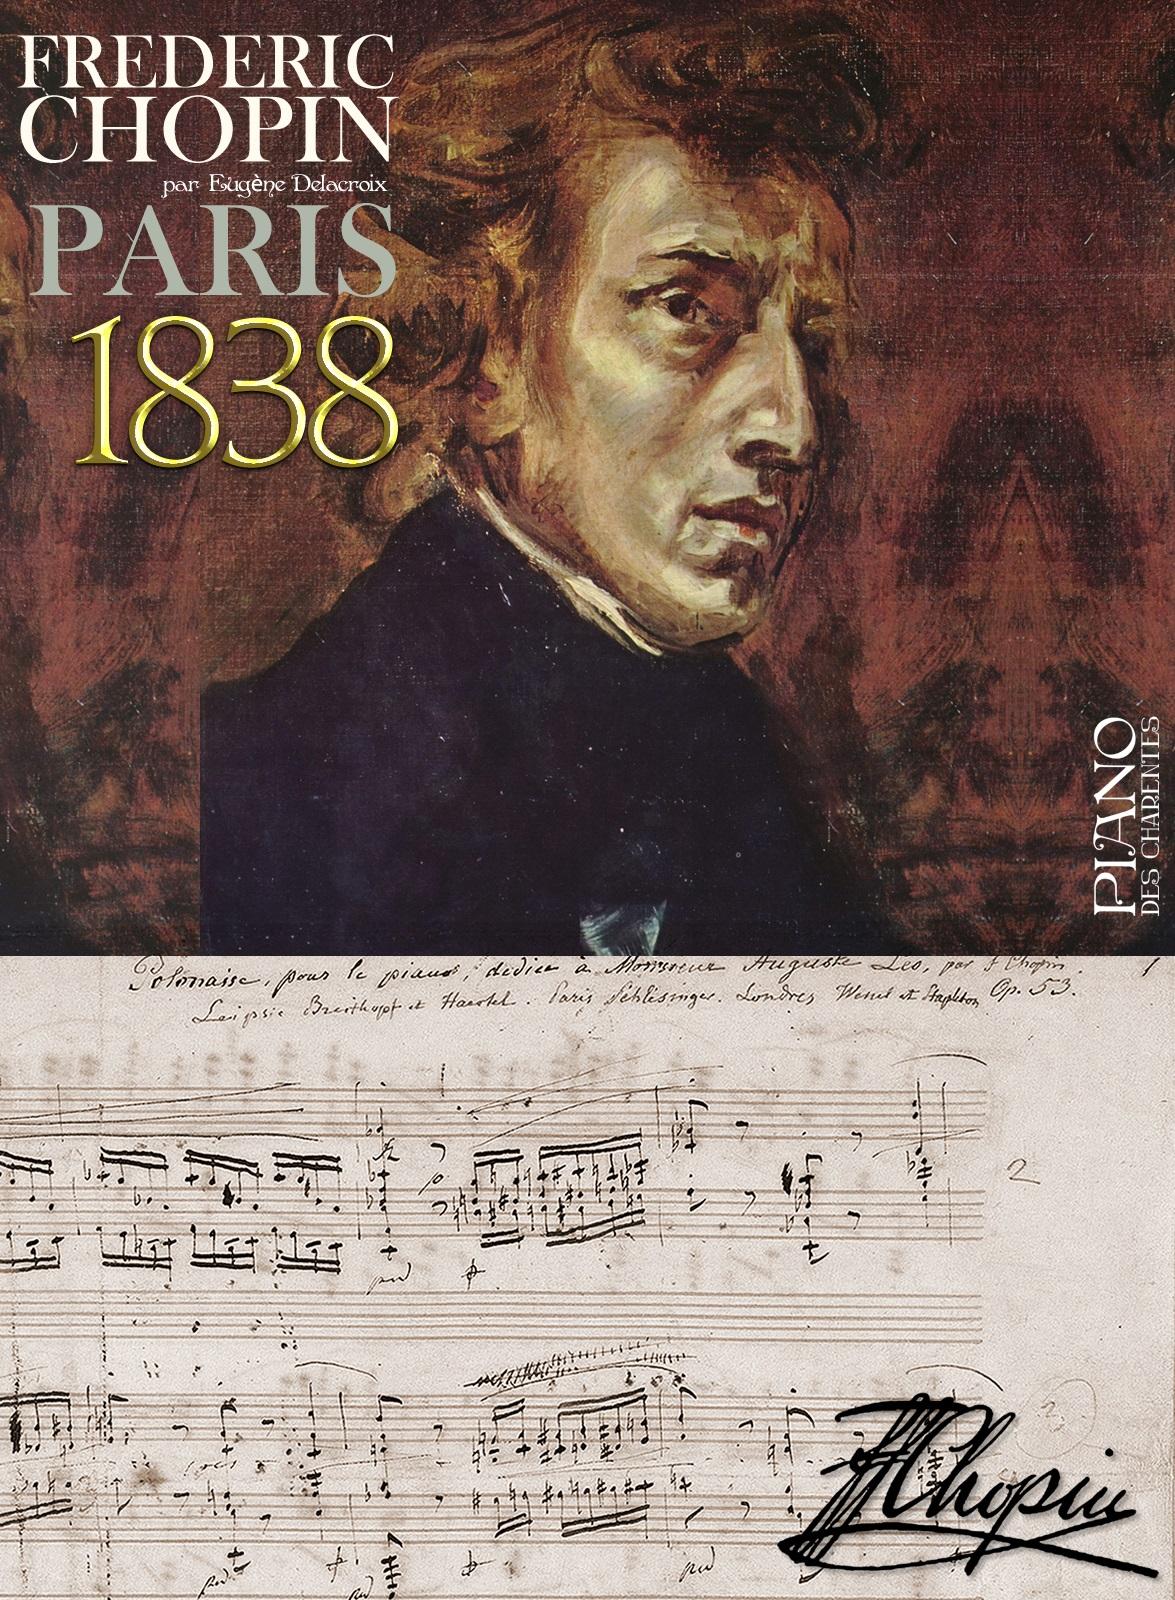 Frédéric Chopin 1838